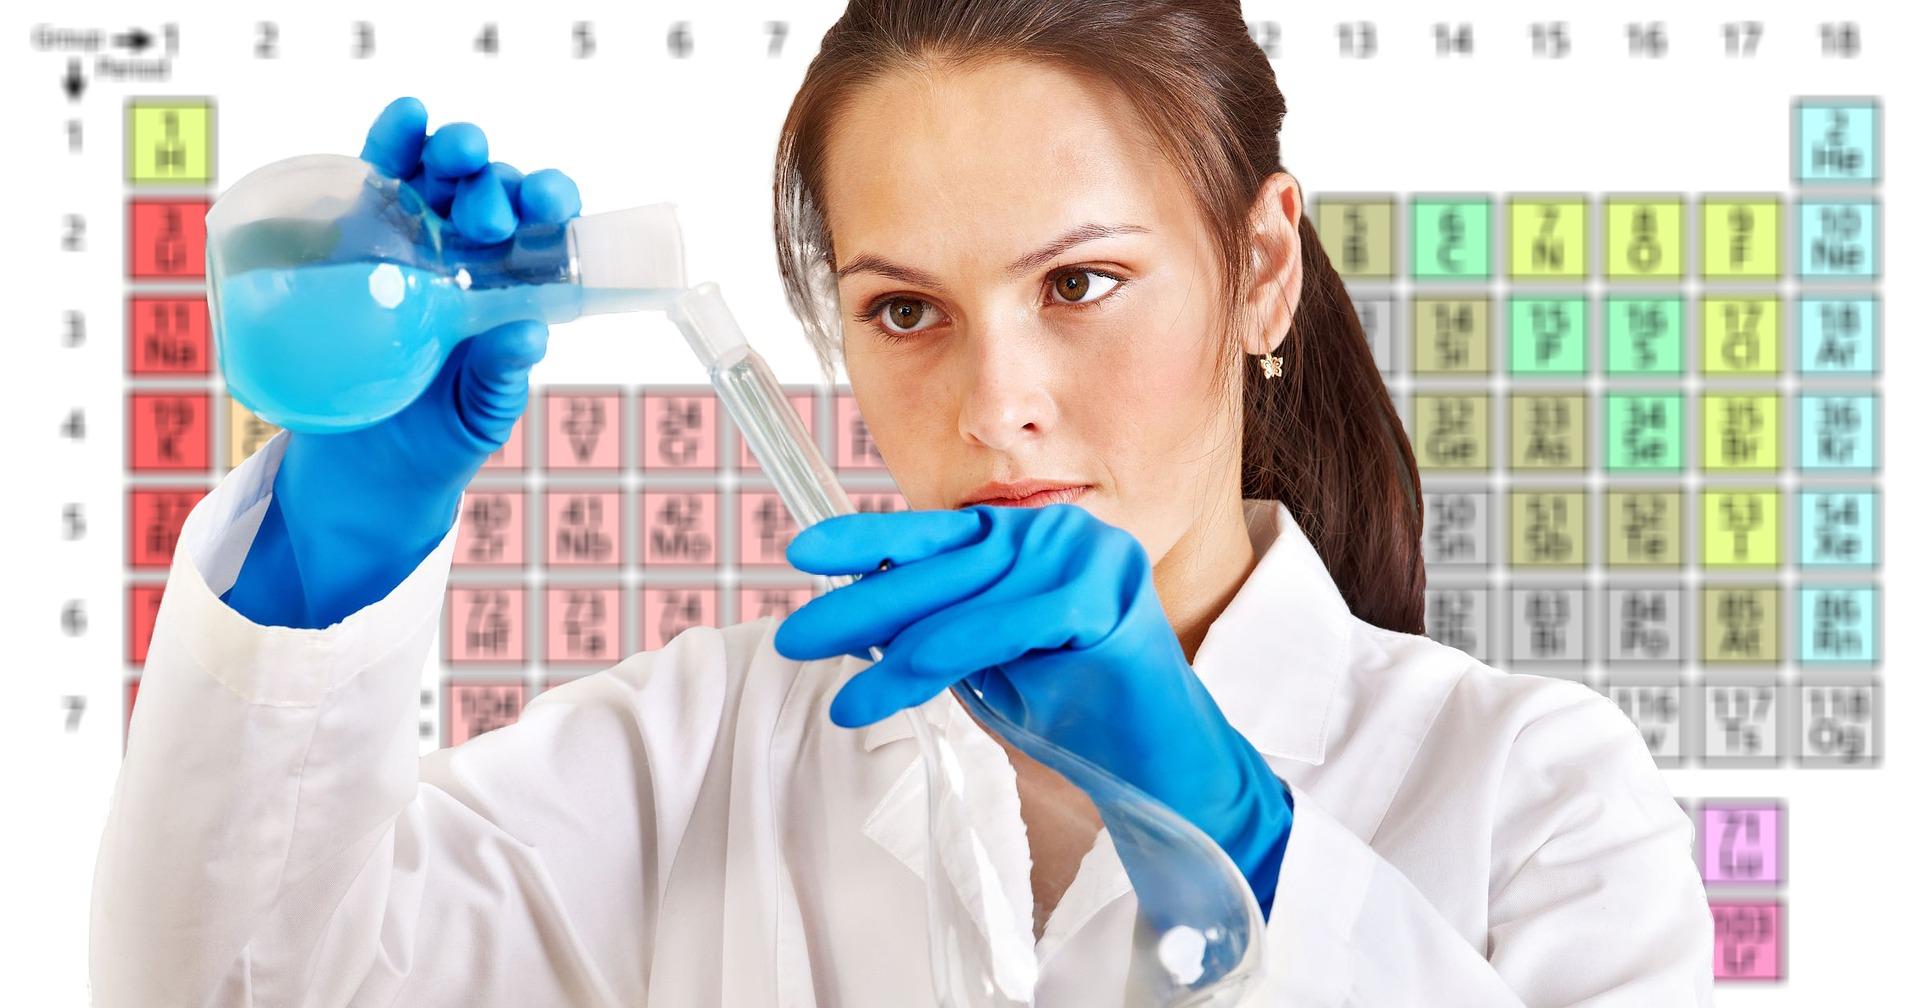 Chemist 3014163 1920